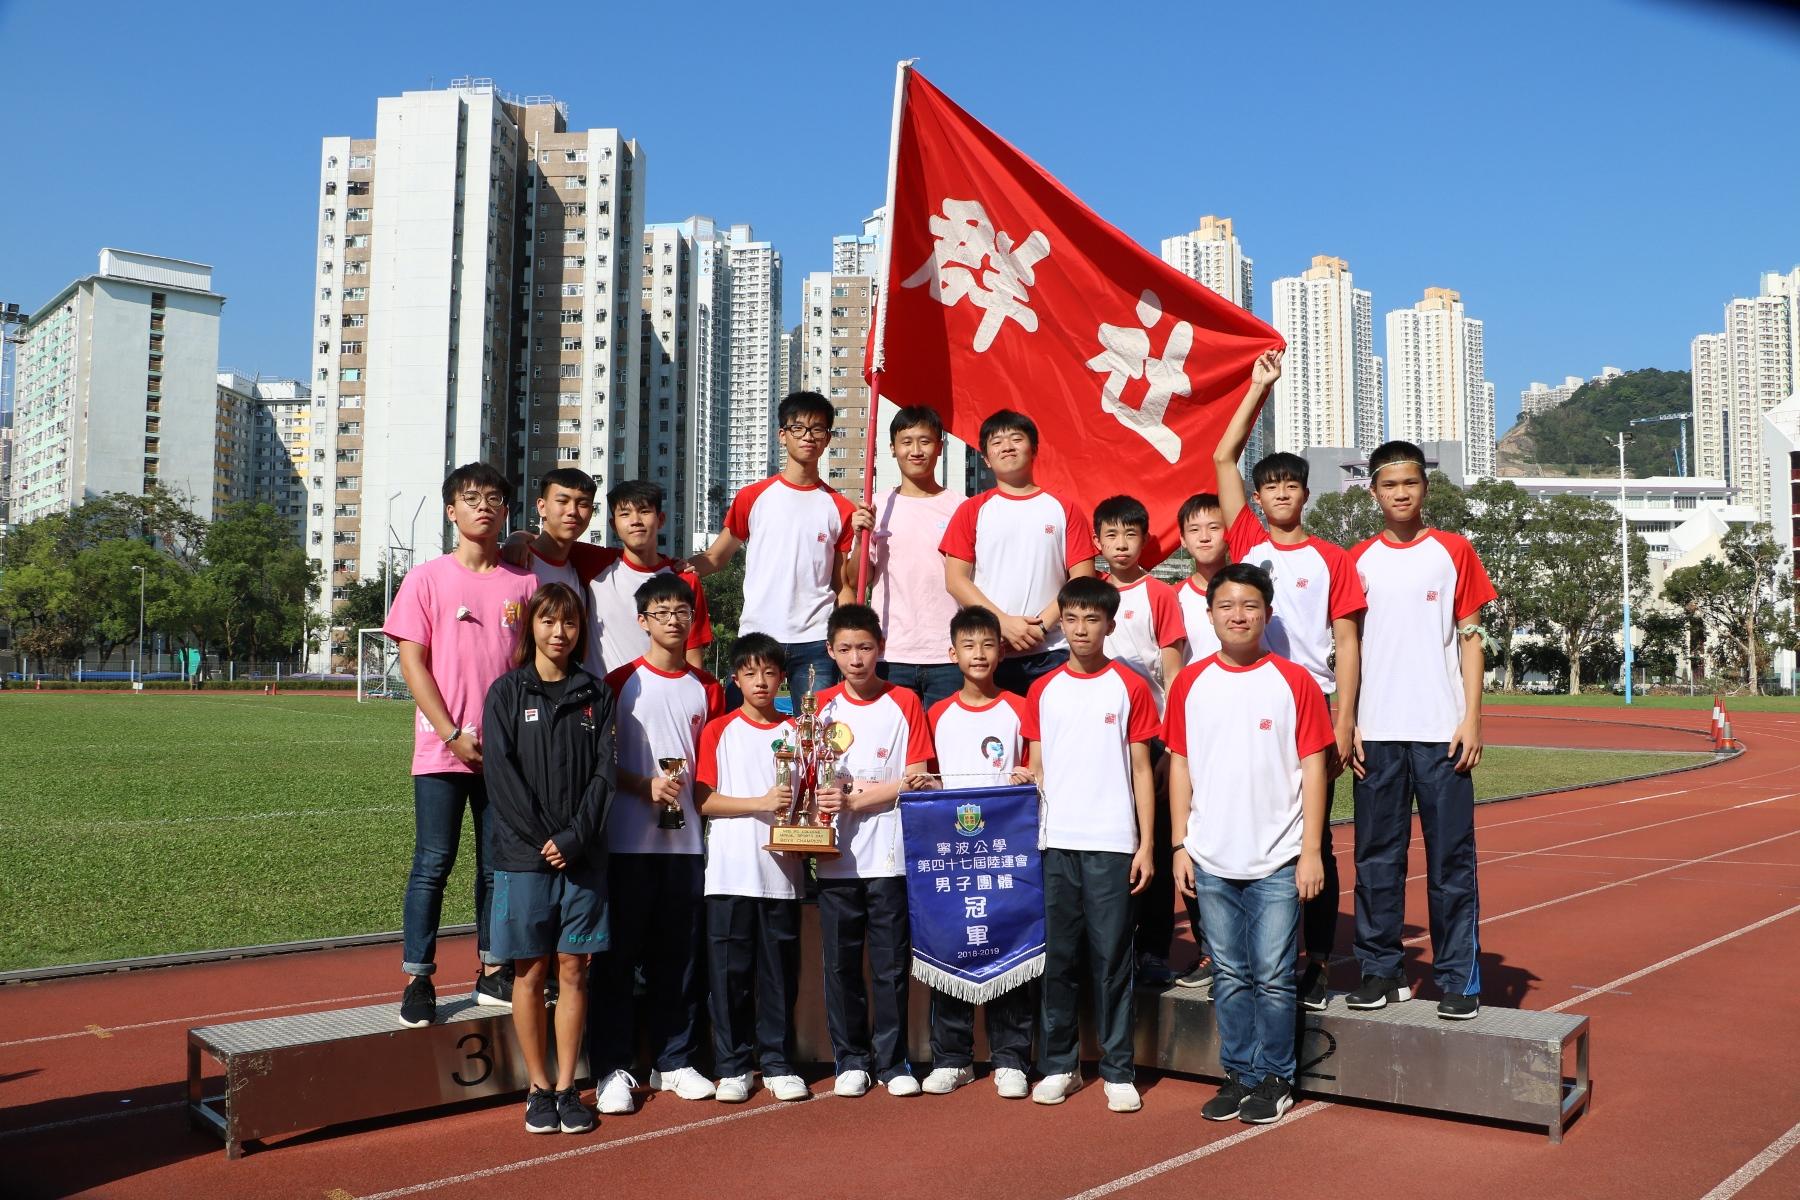 http://npc.edu.hk/sites/default/files/img_4682.jpg